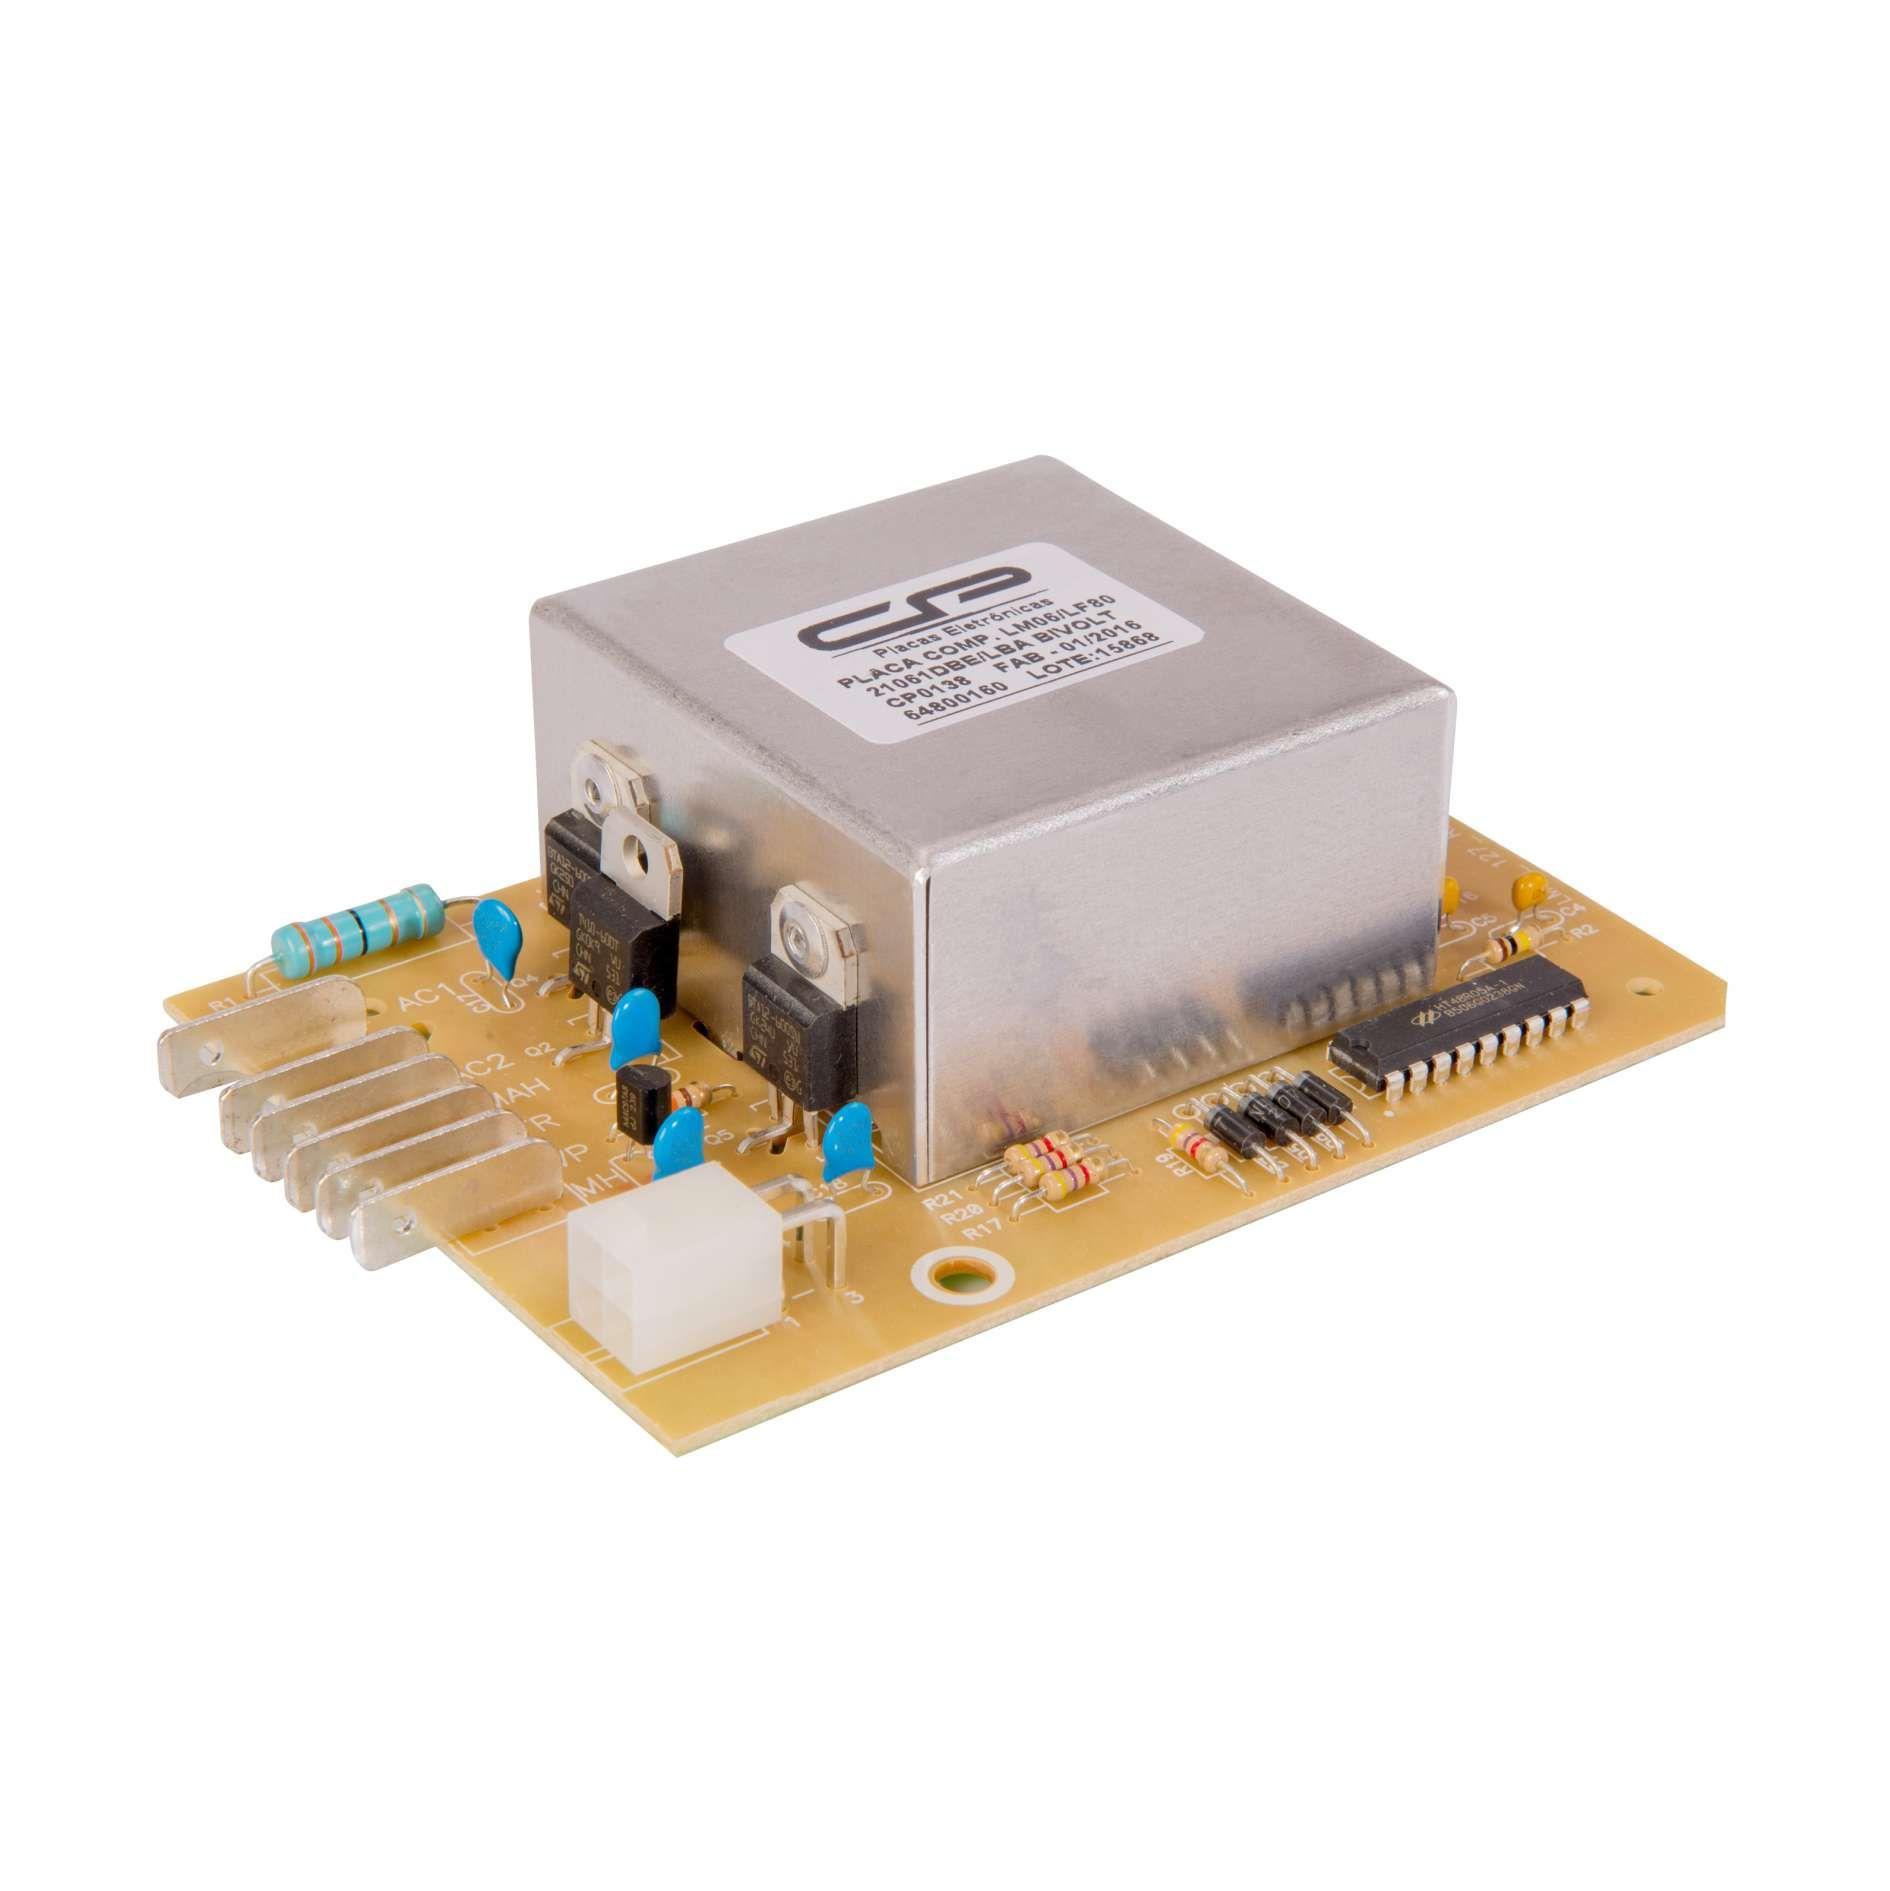 Placa Eletrônica Compatível para Lavadora Electrolux LM06 LF80 64800160 Bivolt CP0138